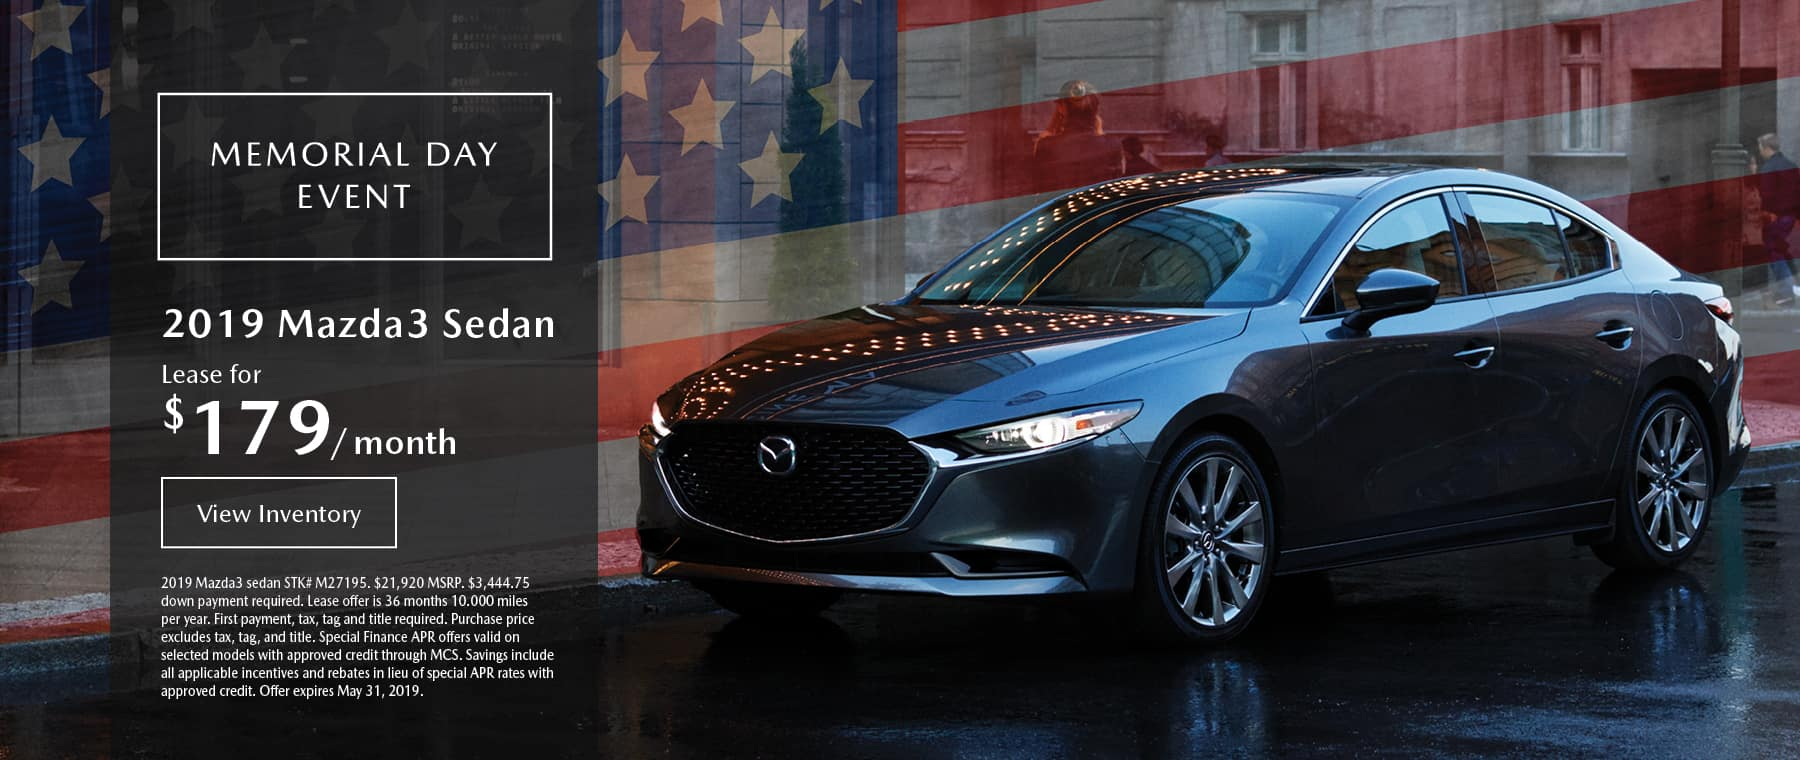 Lease the 2019 Mazda3 sedan for $179 per month, plus tax